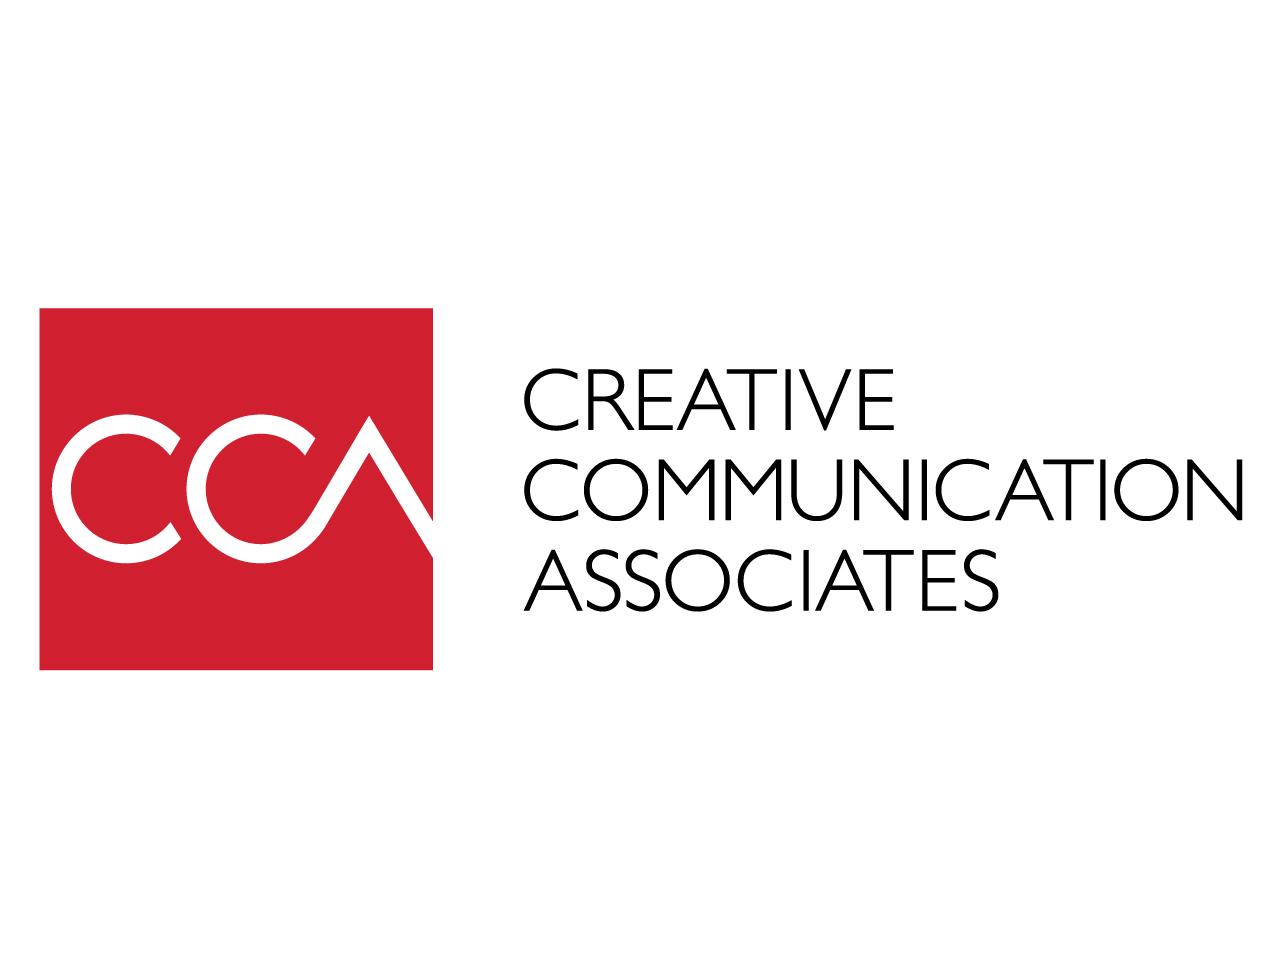 Creative Communication Associates